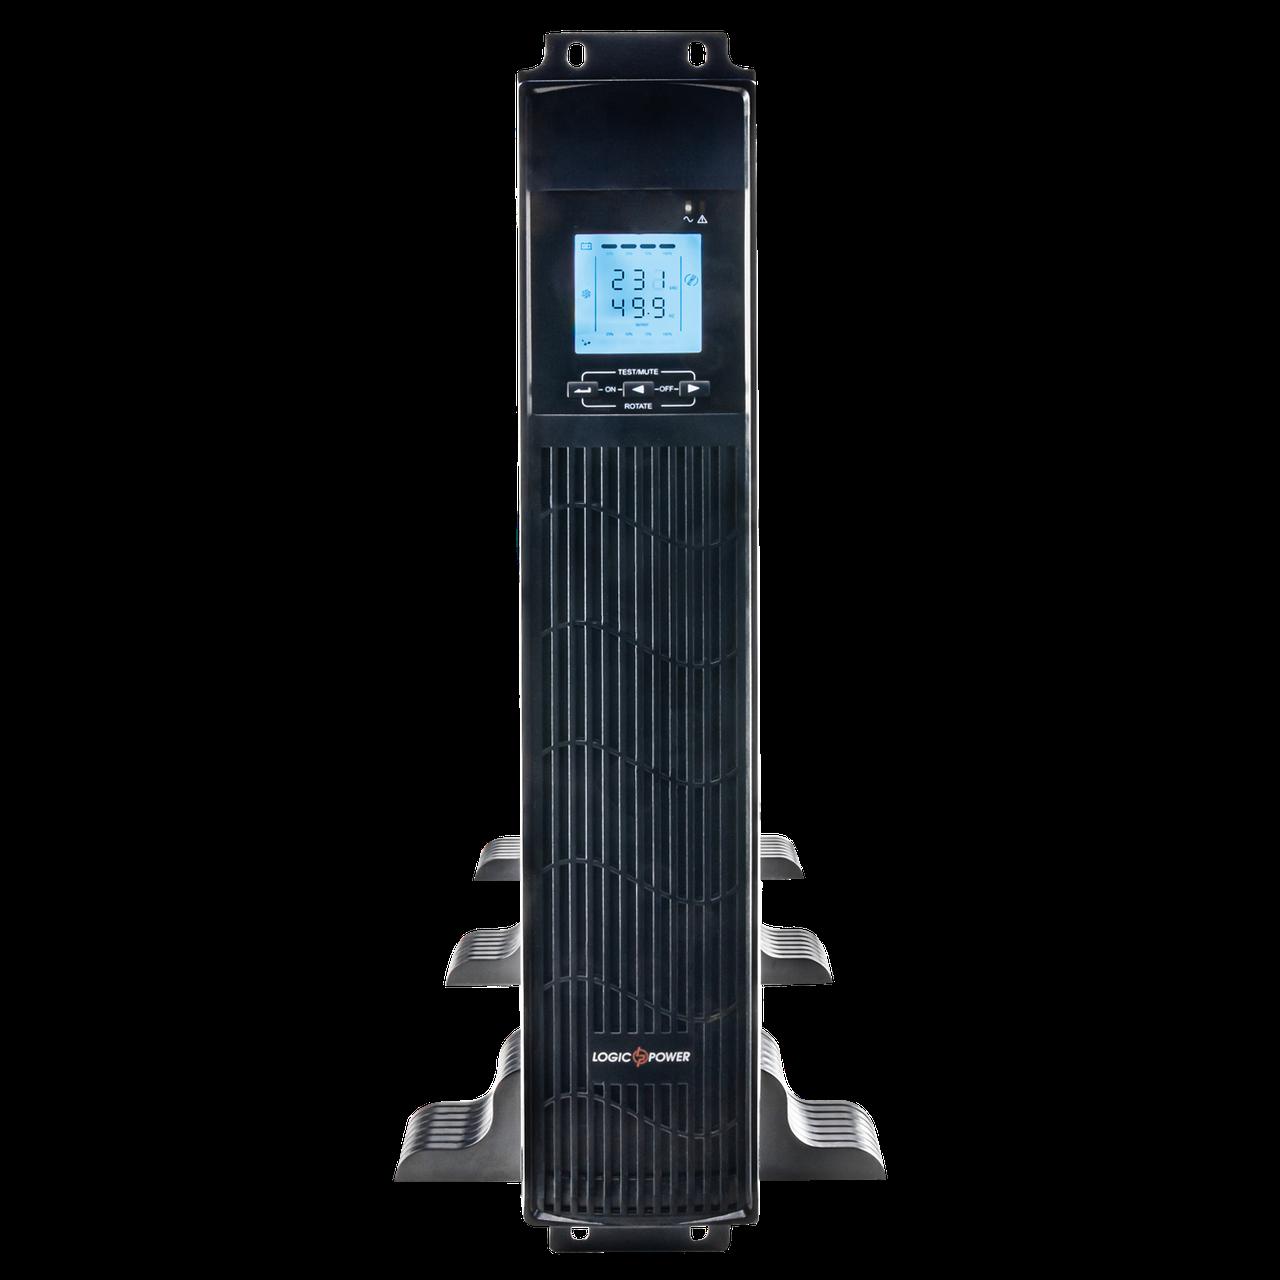 ИБП Smart LogicPower-2000 PRO с комплектом батарей